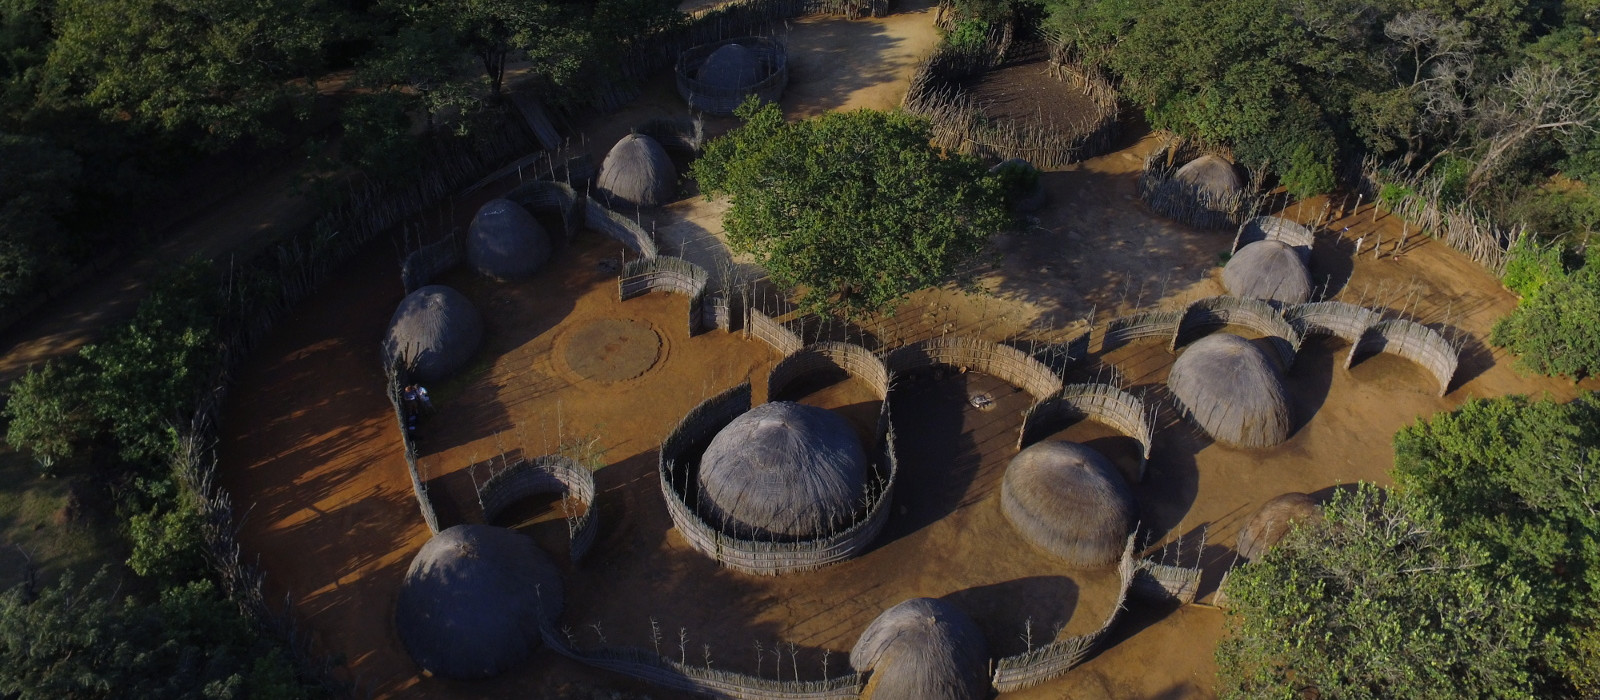 Hotel Mantenga Cultural Village Swasiland